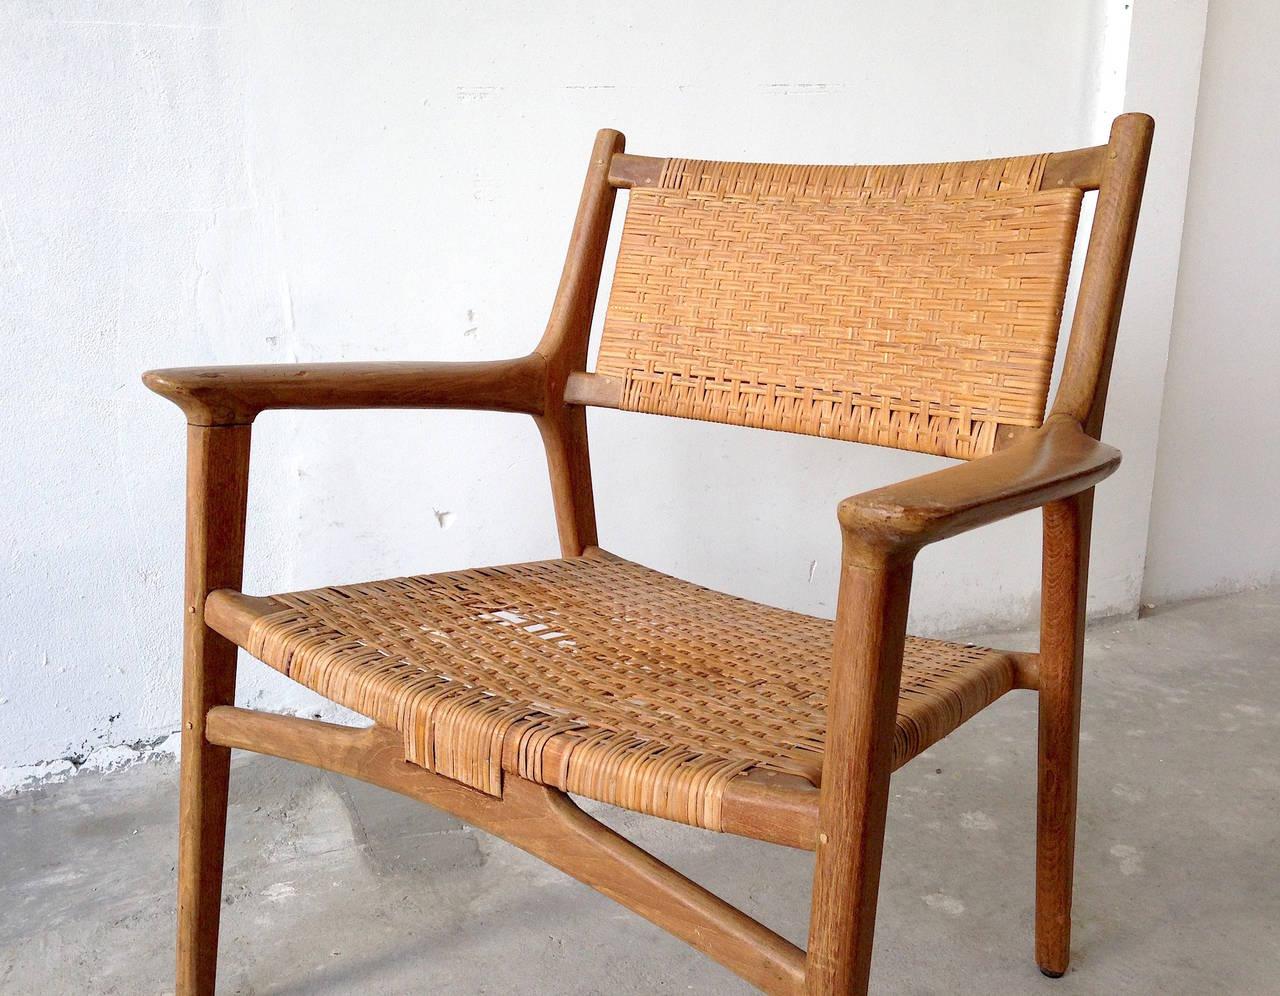 cane easy chair amish made adirondack chairs hans j wegner for johannes hansen teak